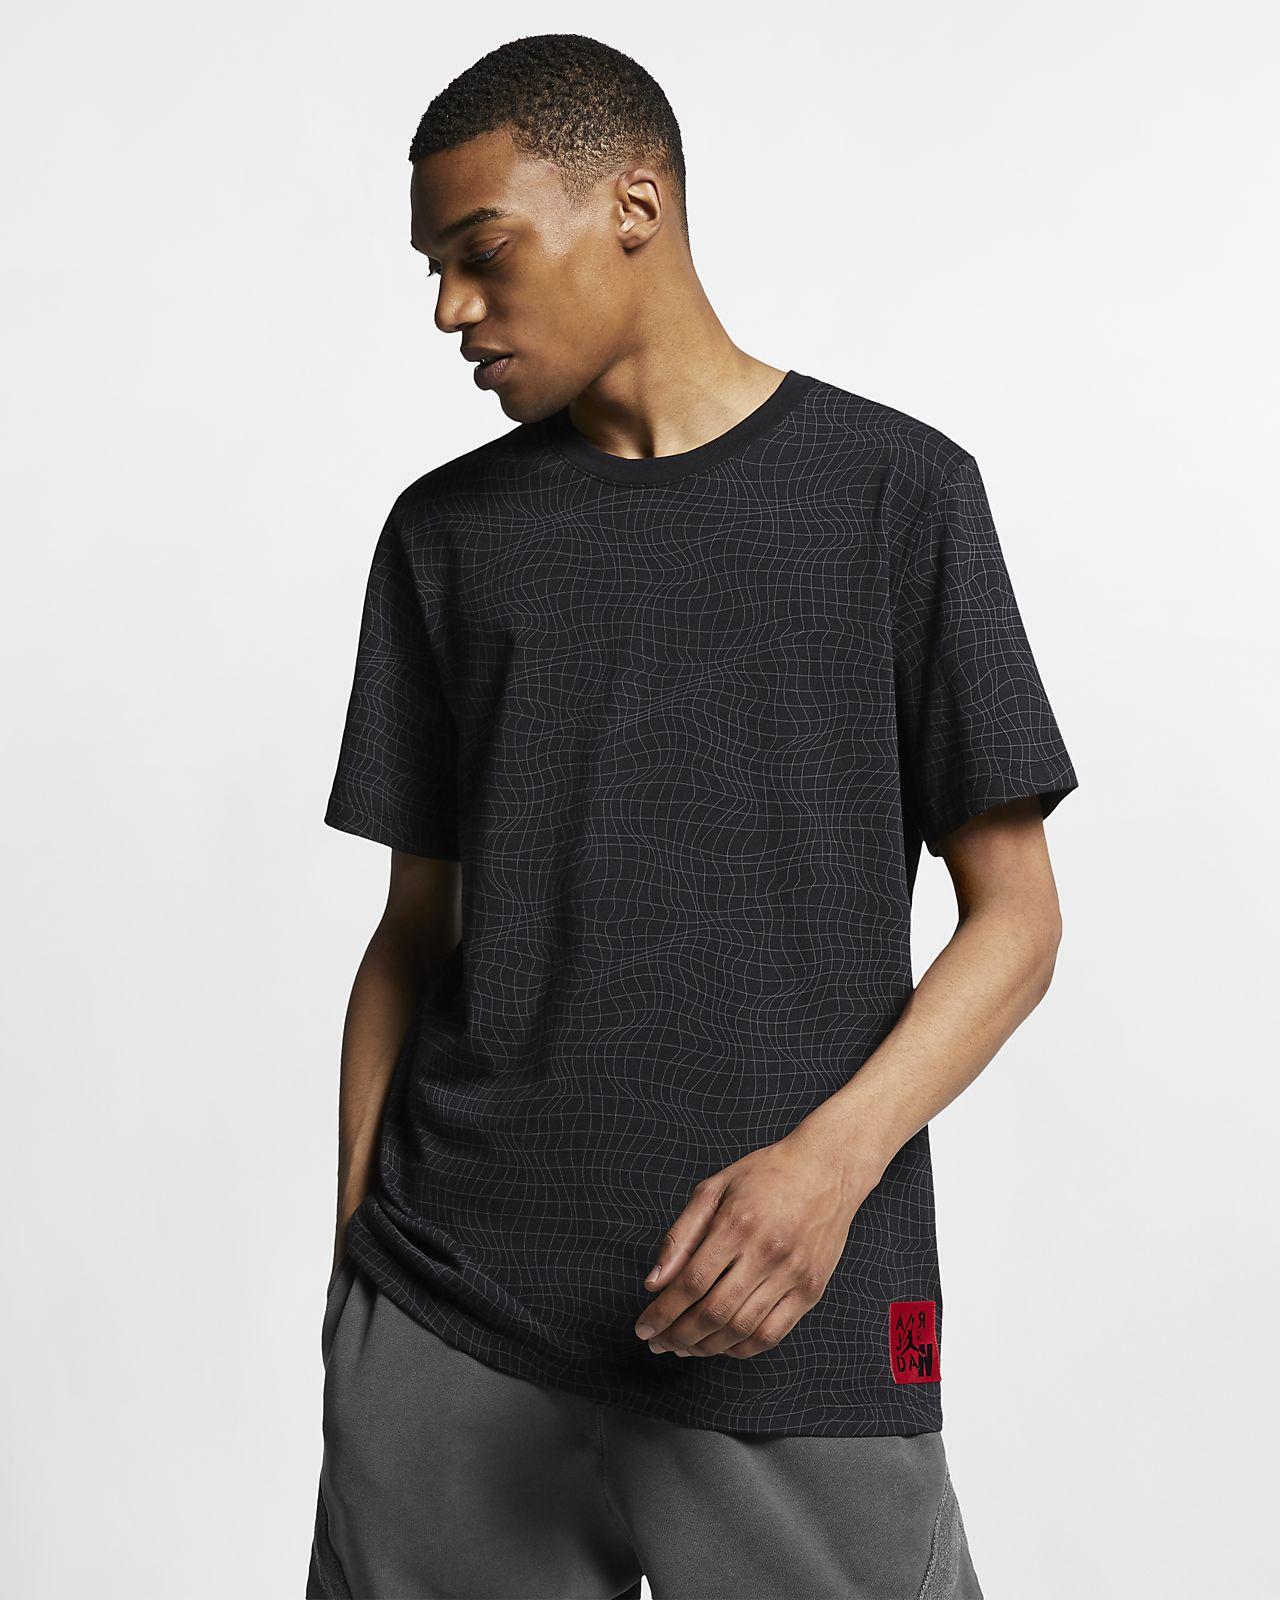 8a0c78f00410a9 Jordan Legacy AJ4 Men s T-Shirt. Nike.com